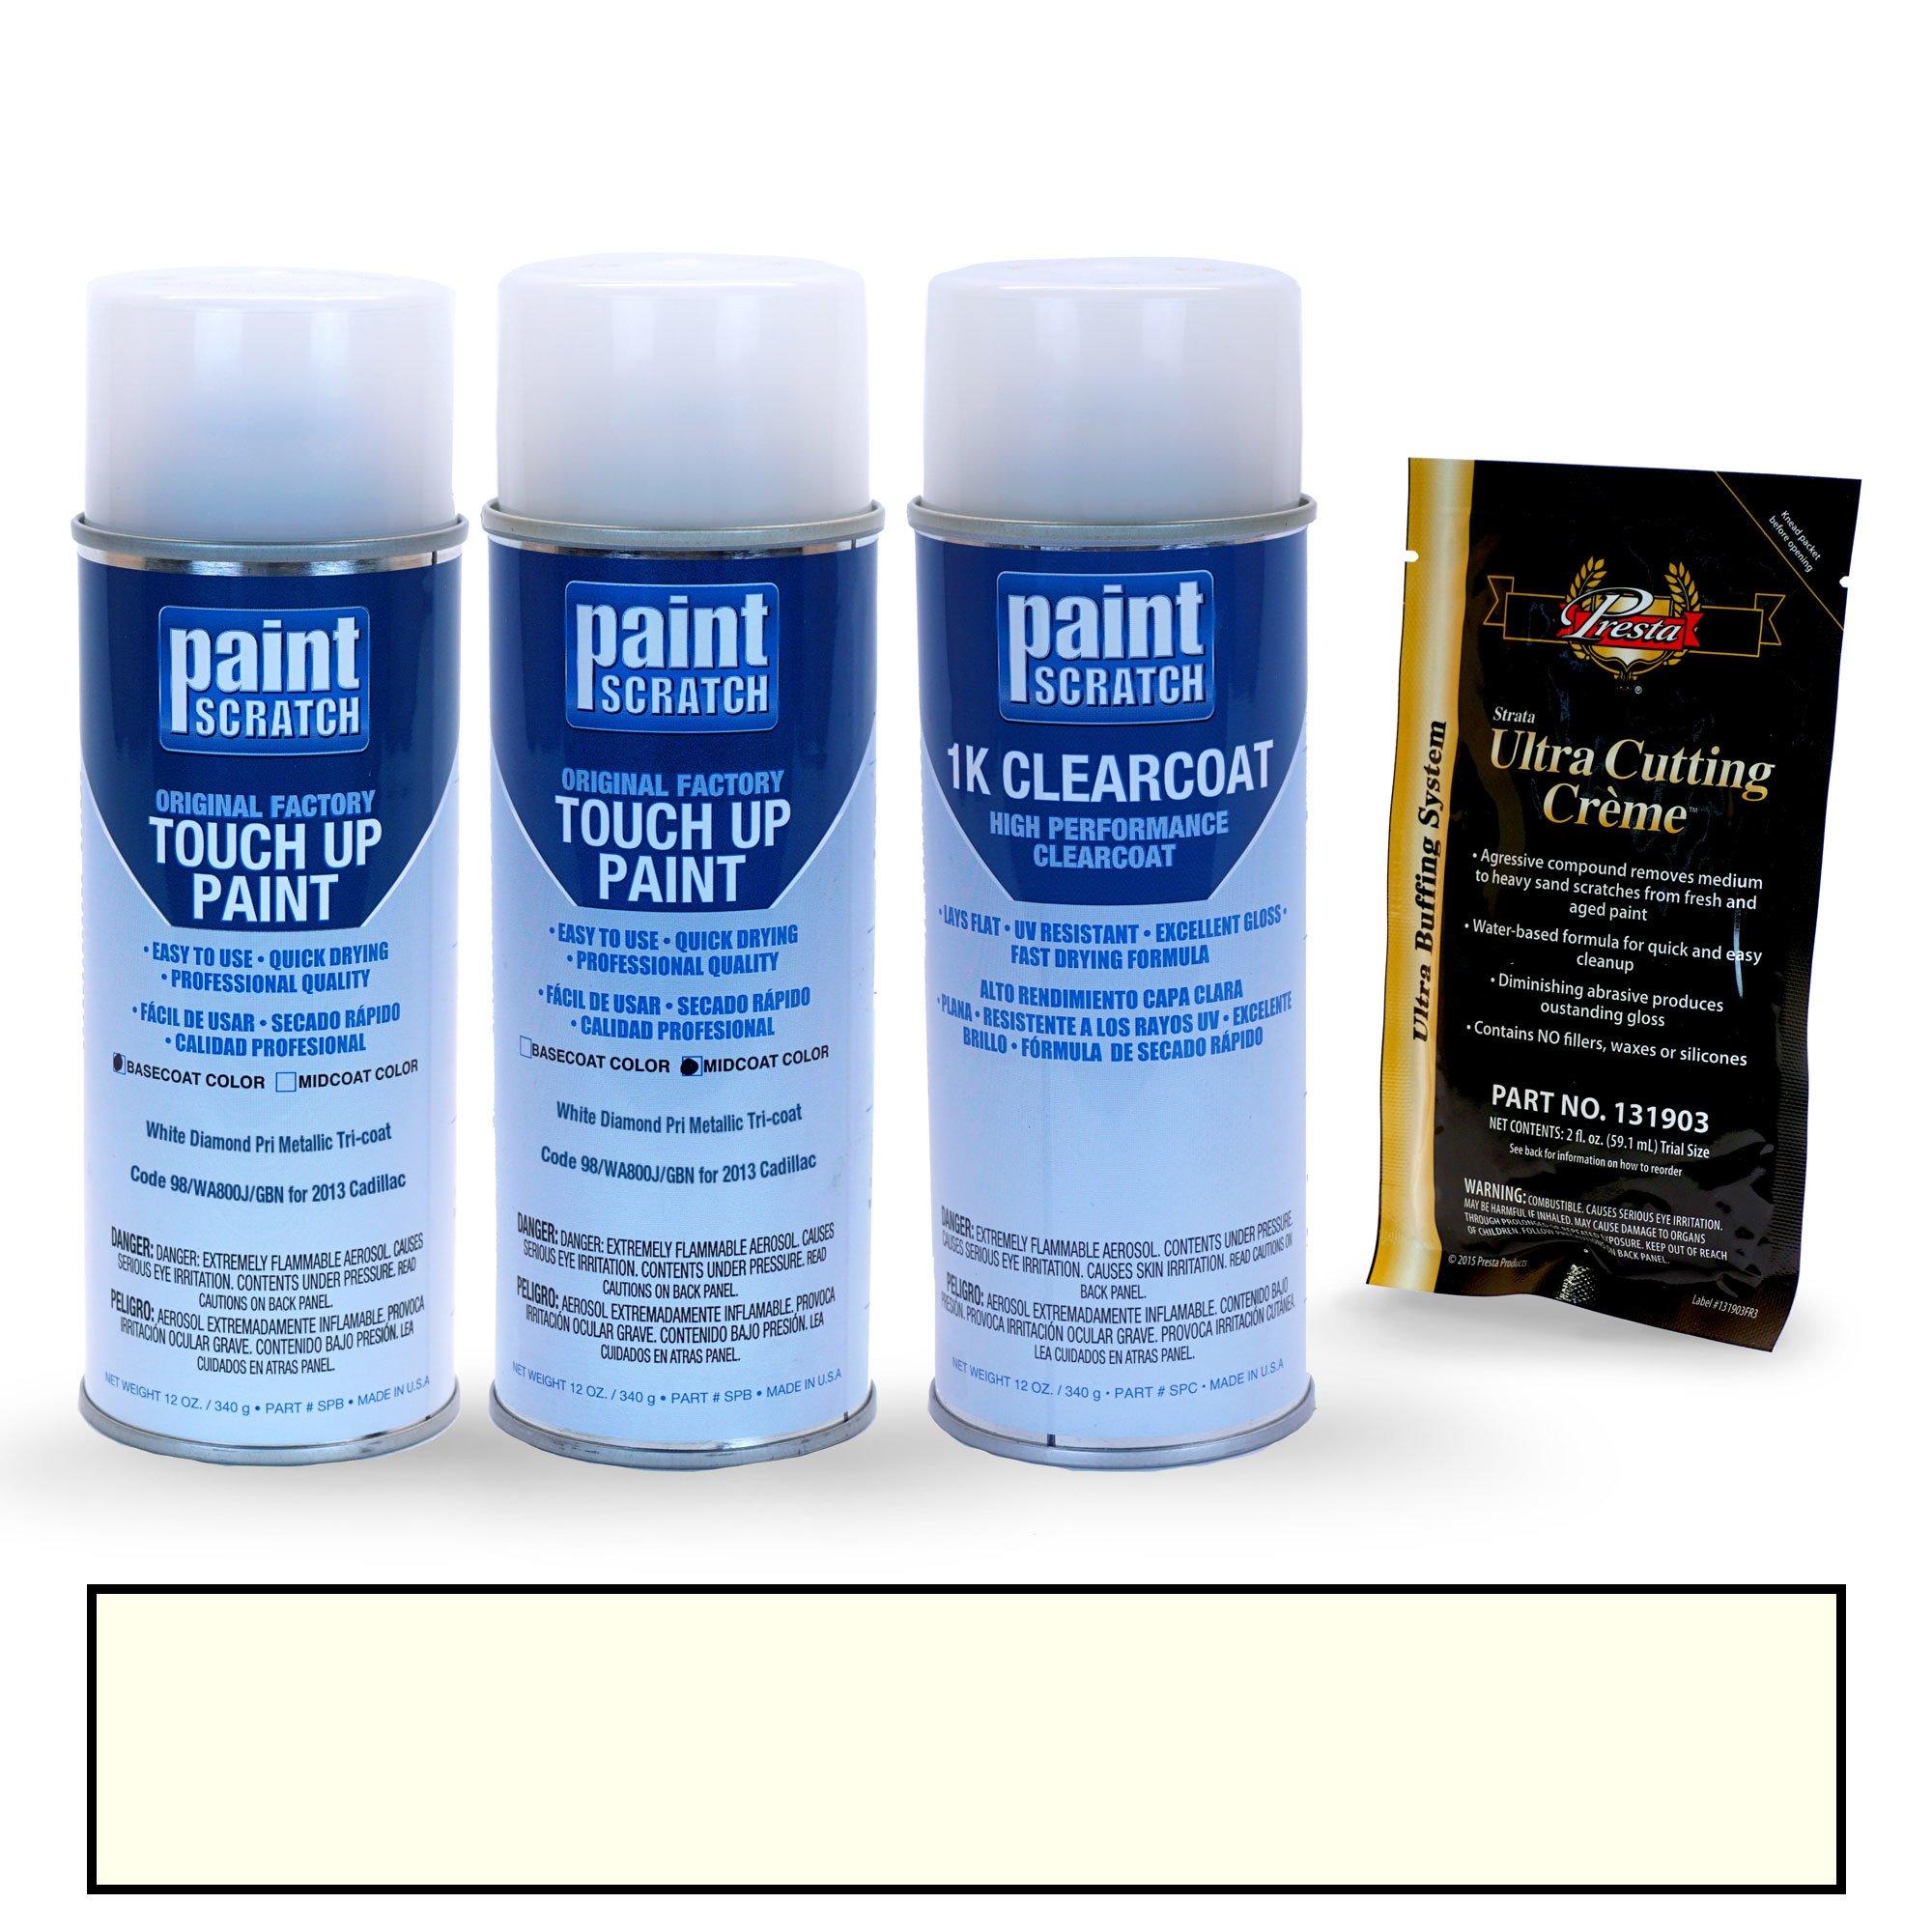 PAINTSCRATCH White Diamond Pri Metallic Tri-Coat 98/WA800J/GBN for 2013 Cadillac Escalade - Touch Up Paint Spray Can Kit - Original Factory OEM Automotive Paint - Color Match Guaranteed